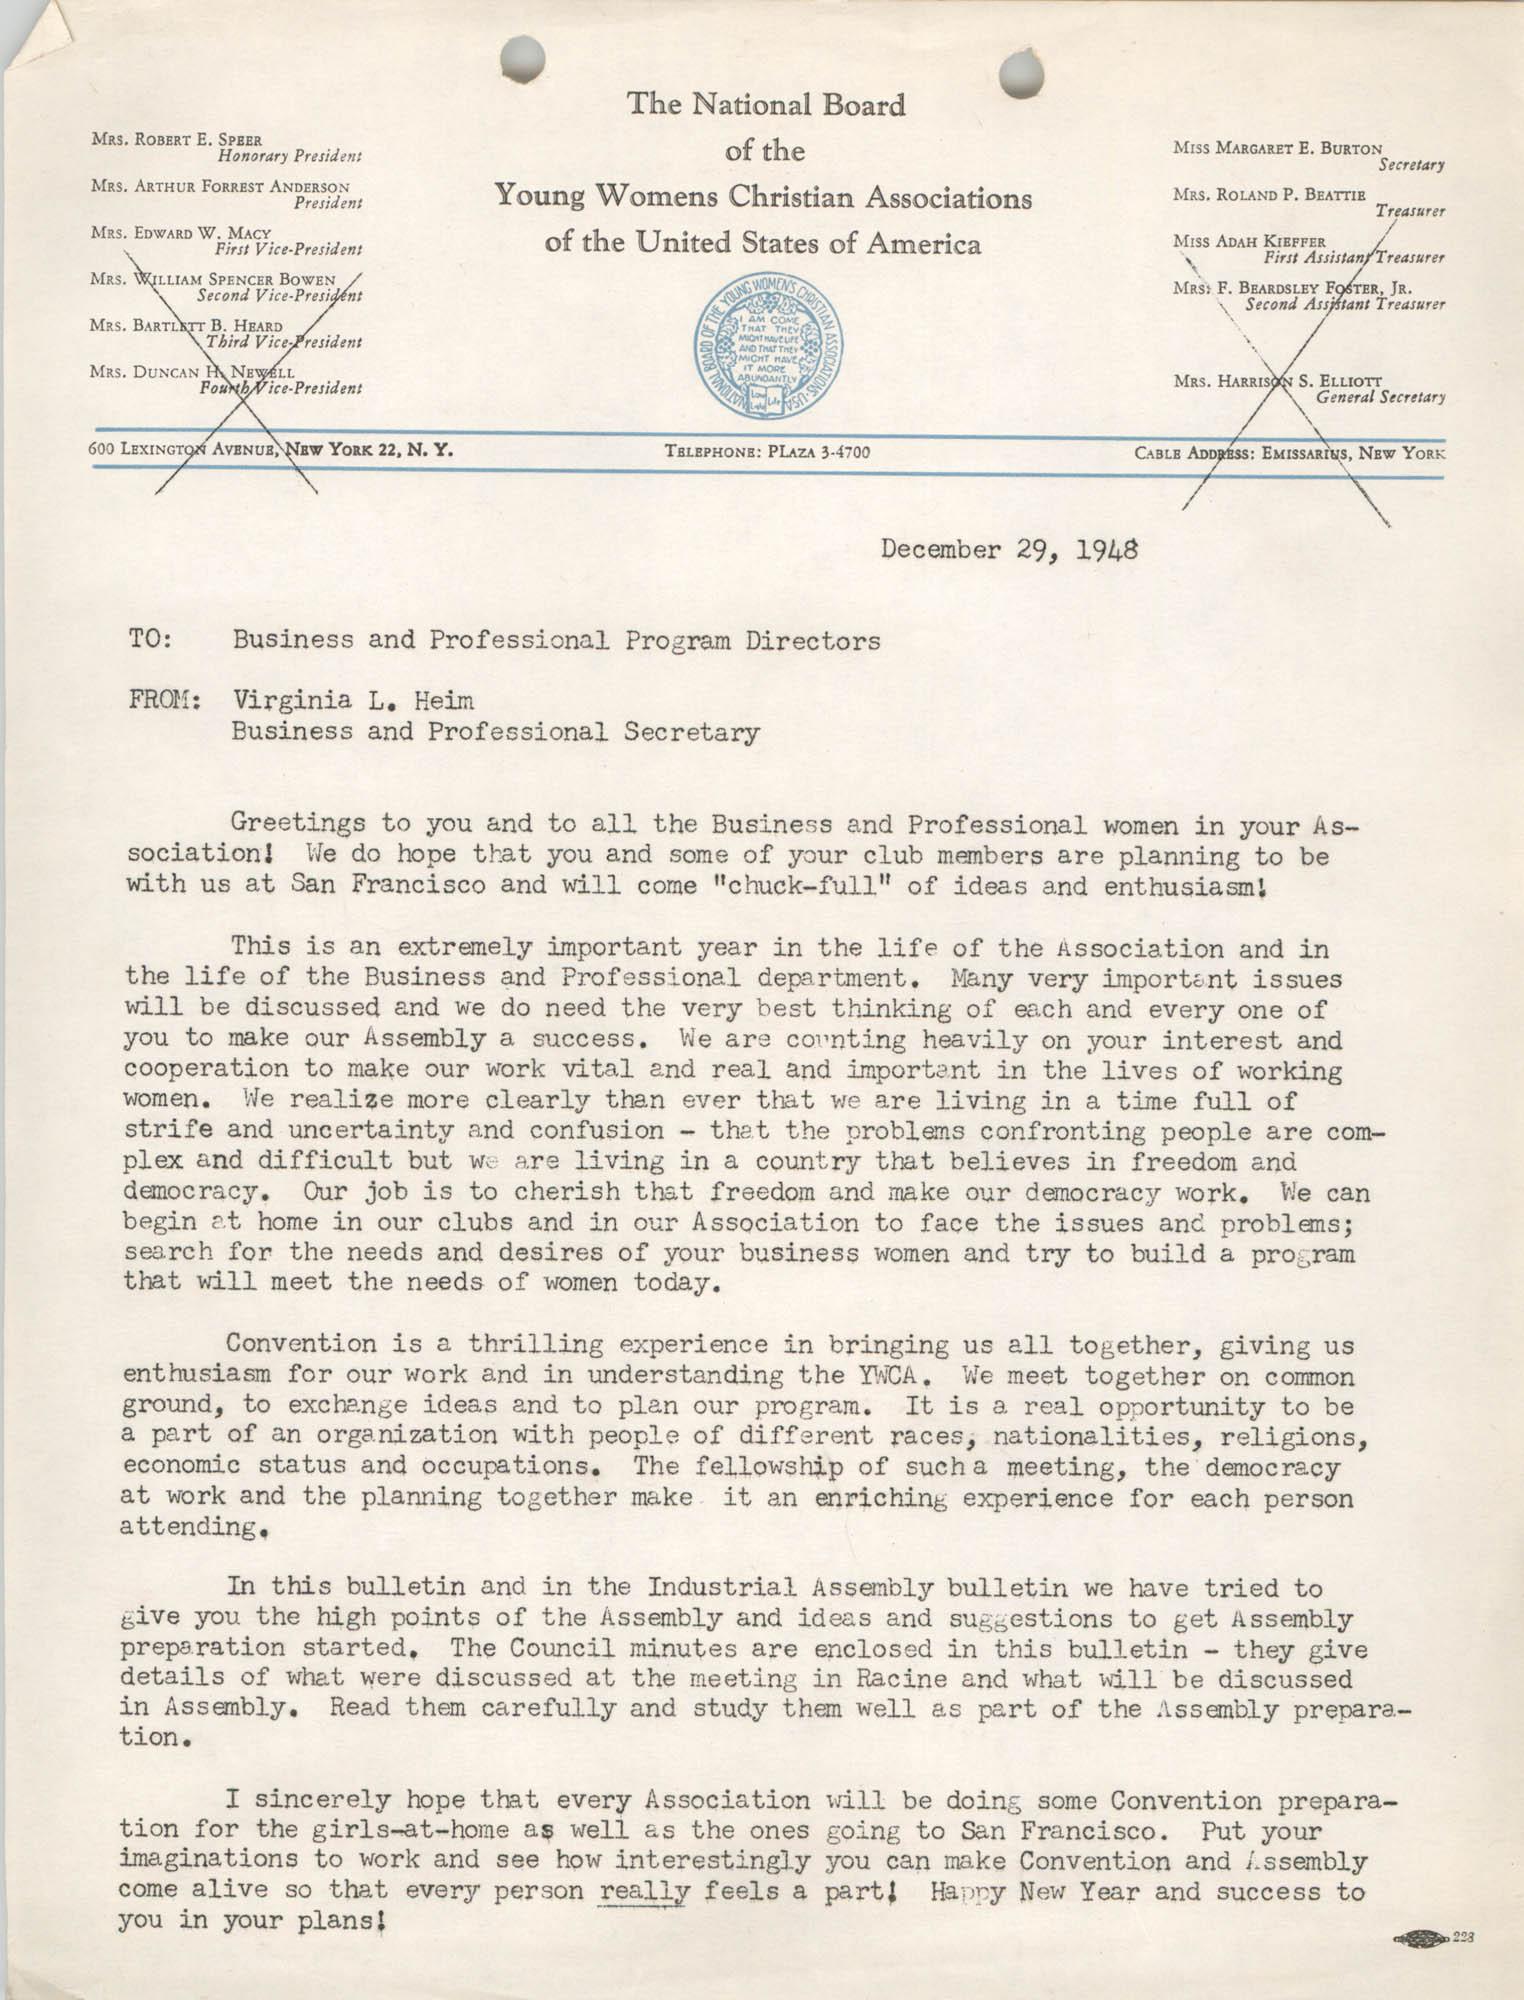 National Board of the Y.W.C.A. Memorandum, December 29, 1948